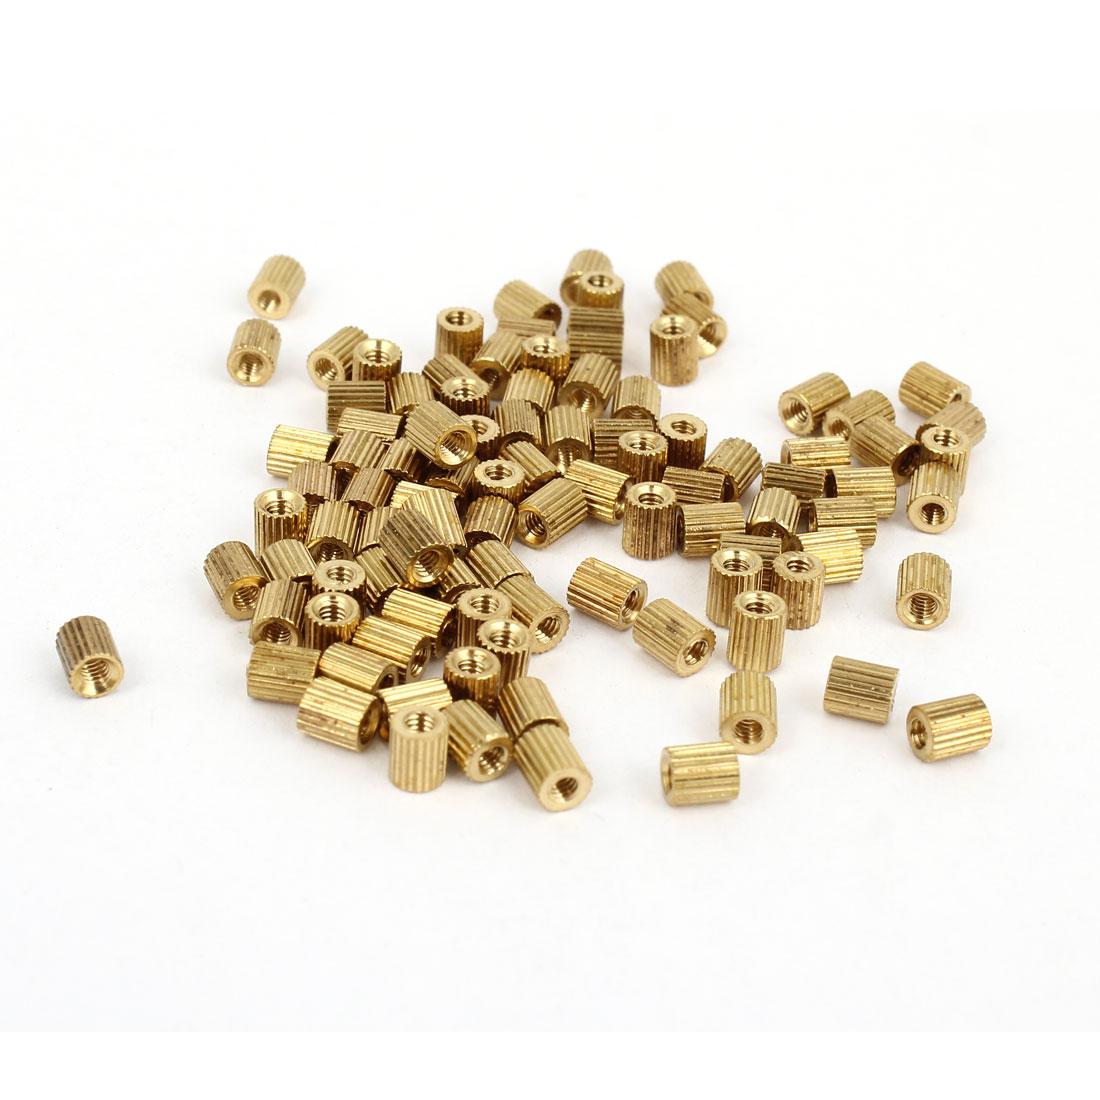 100 Pcs Female Threaded Pillars Brass Standoff Spacer Gold Tone M2x4mm